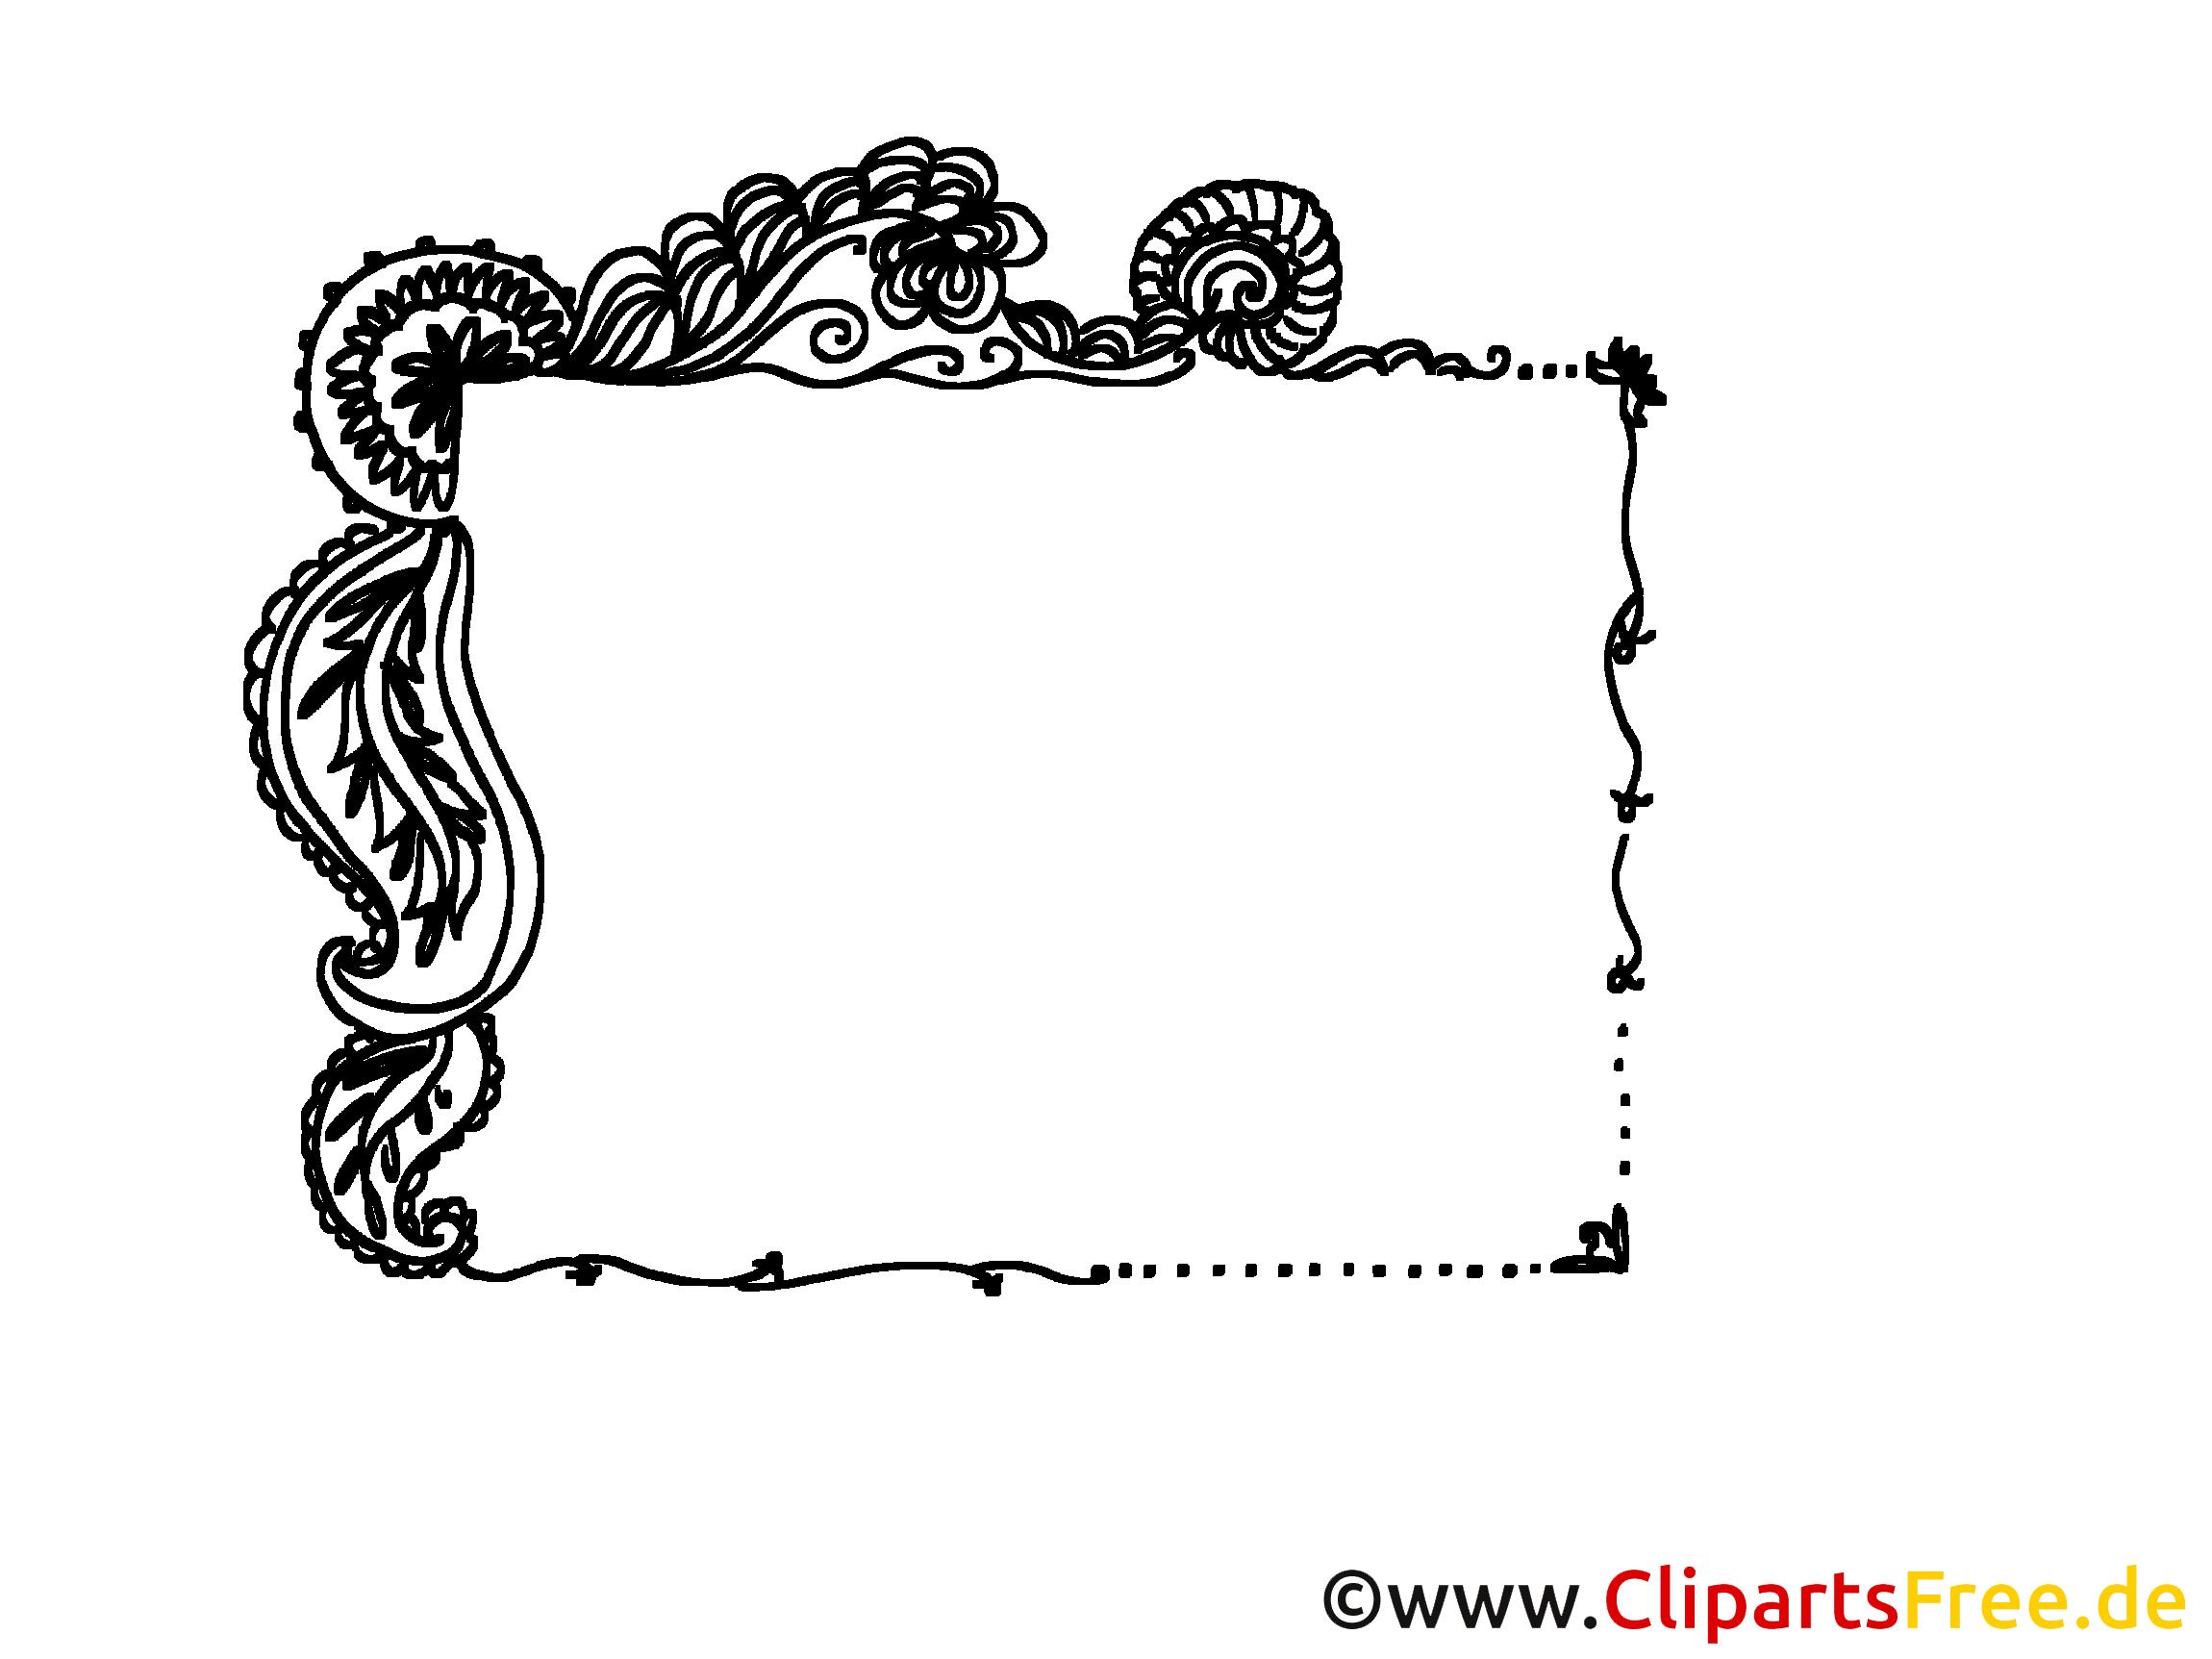 Coloriage dessin cadre cliparts t l charger cadres dessin picture image graphic clip art - Dessin a telecharger ...